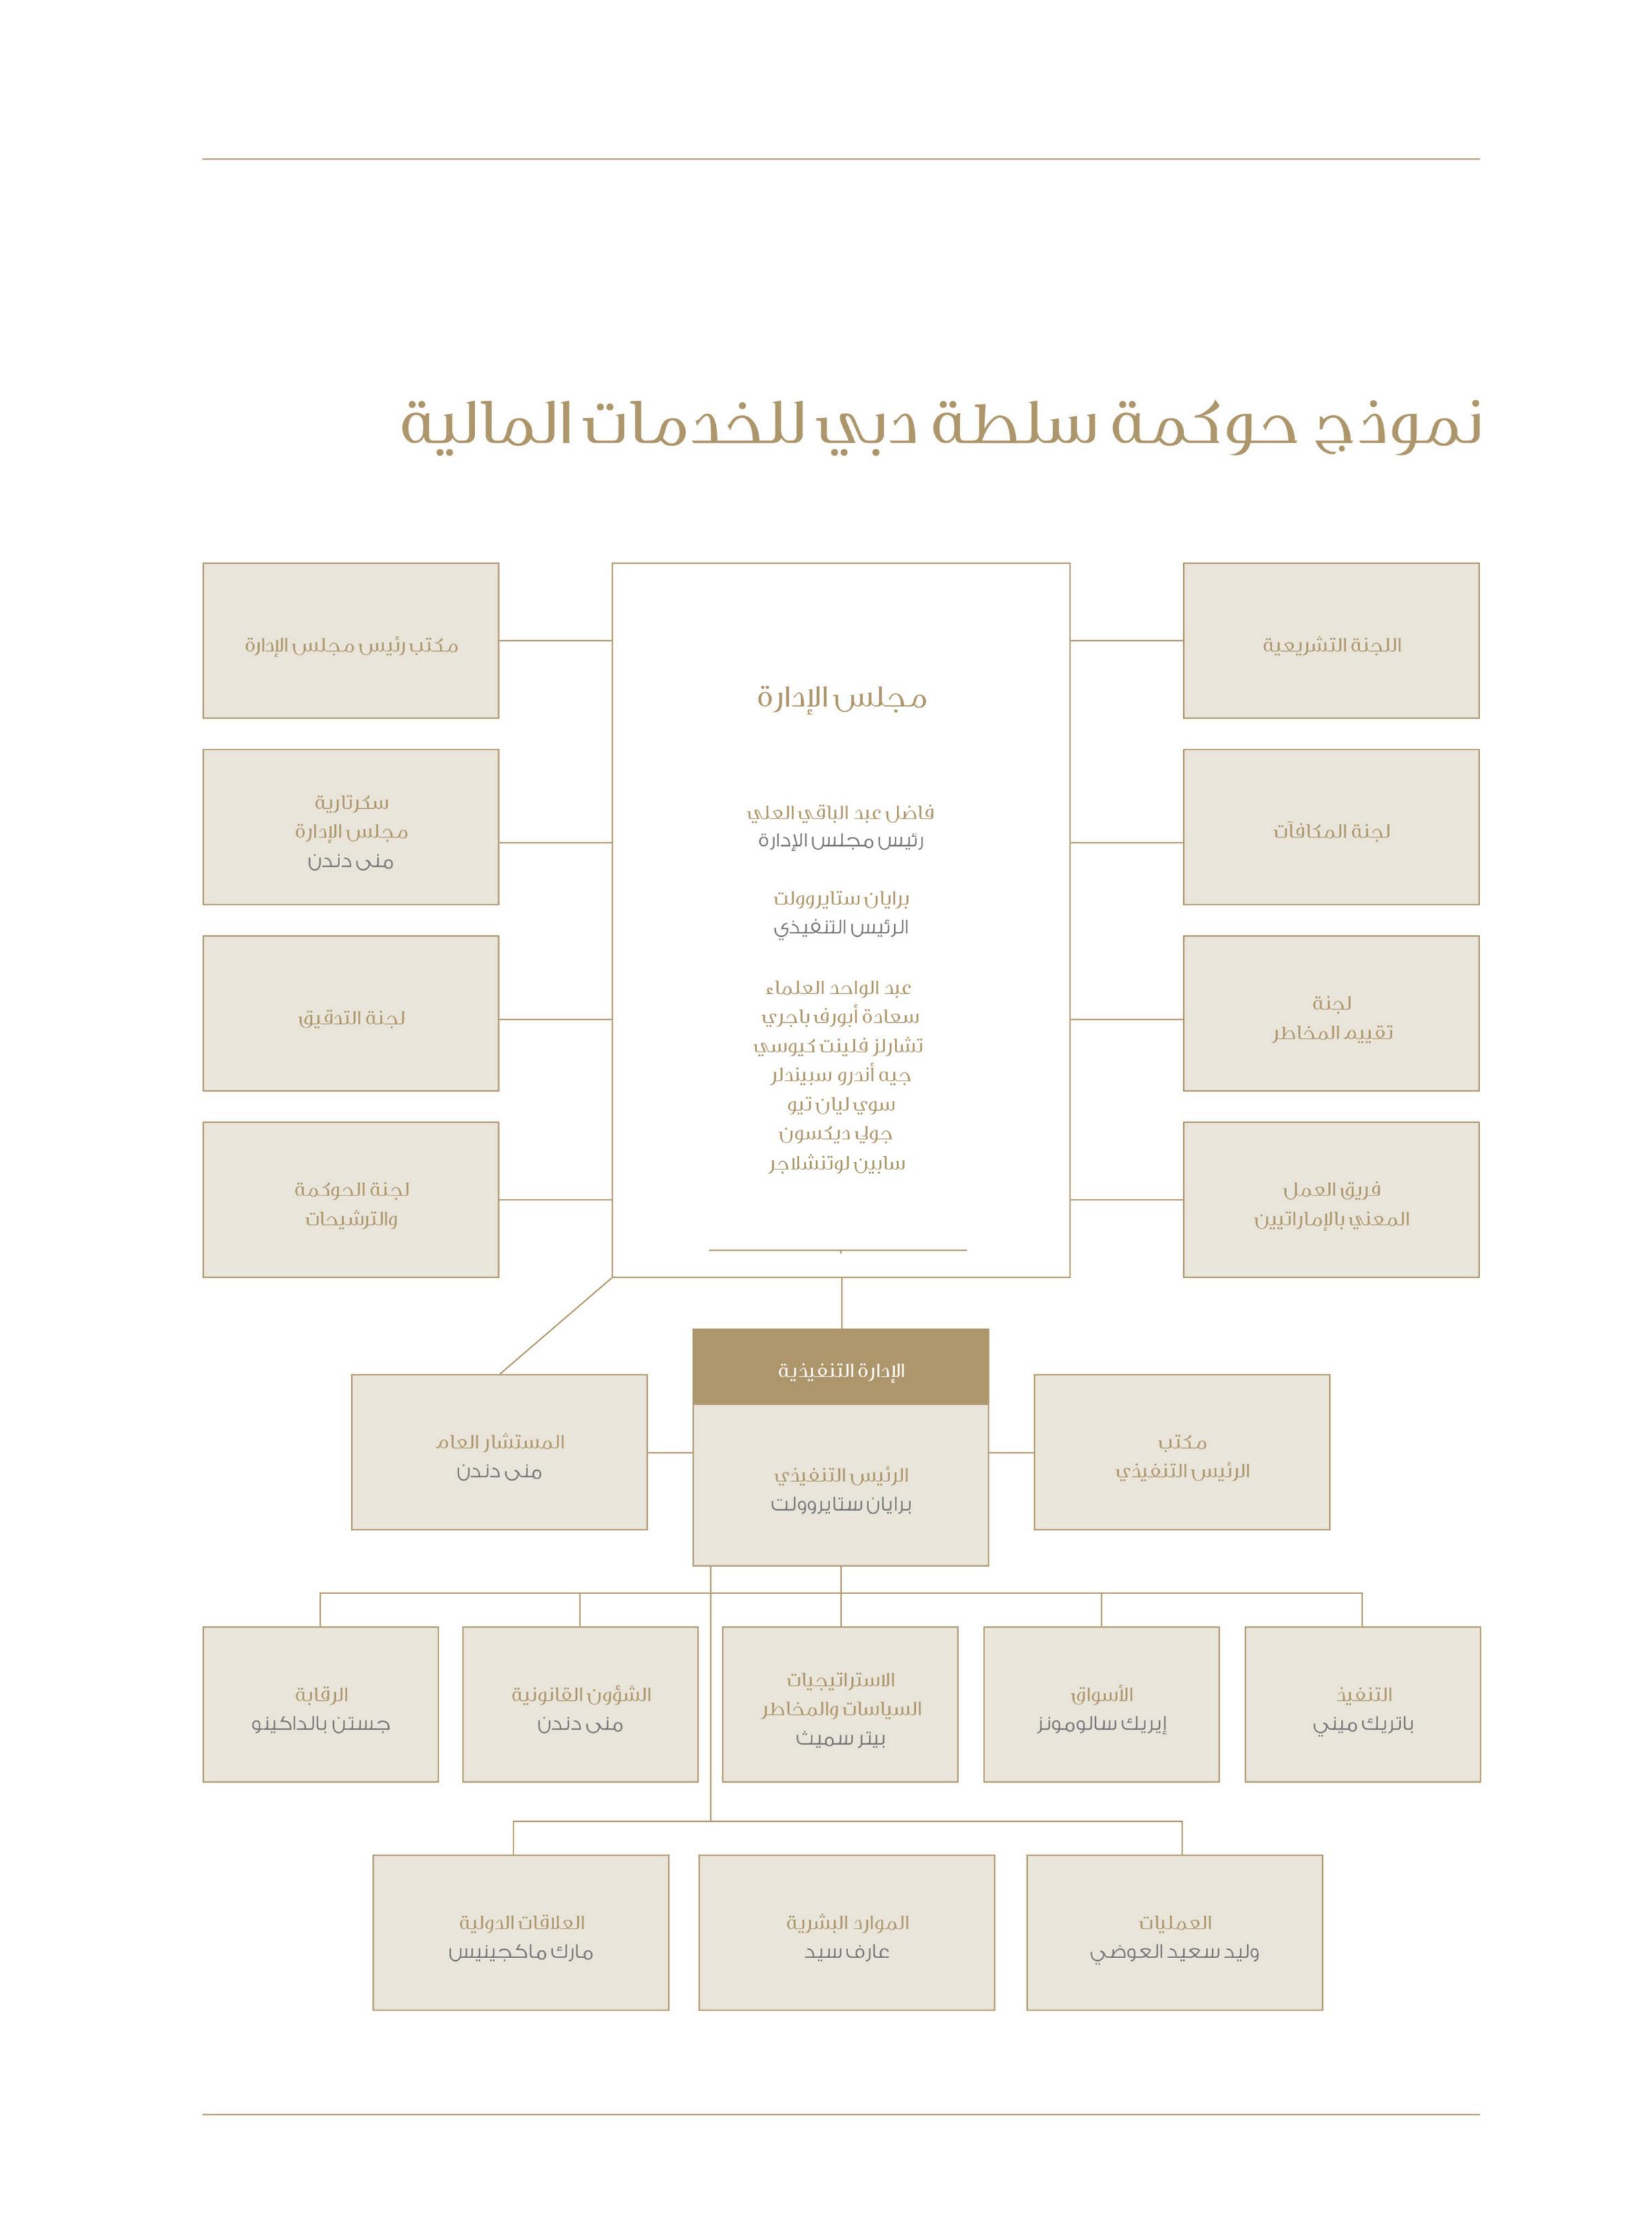 DFSA Structure